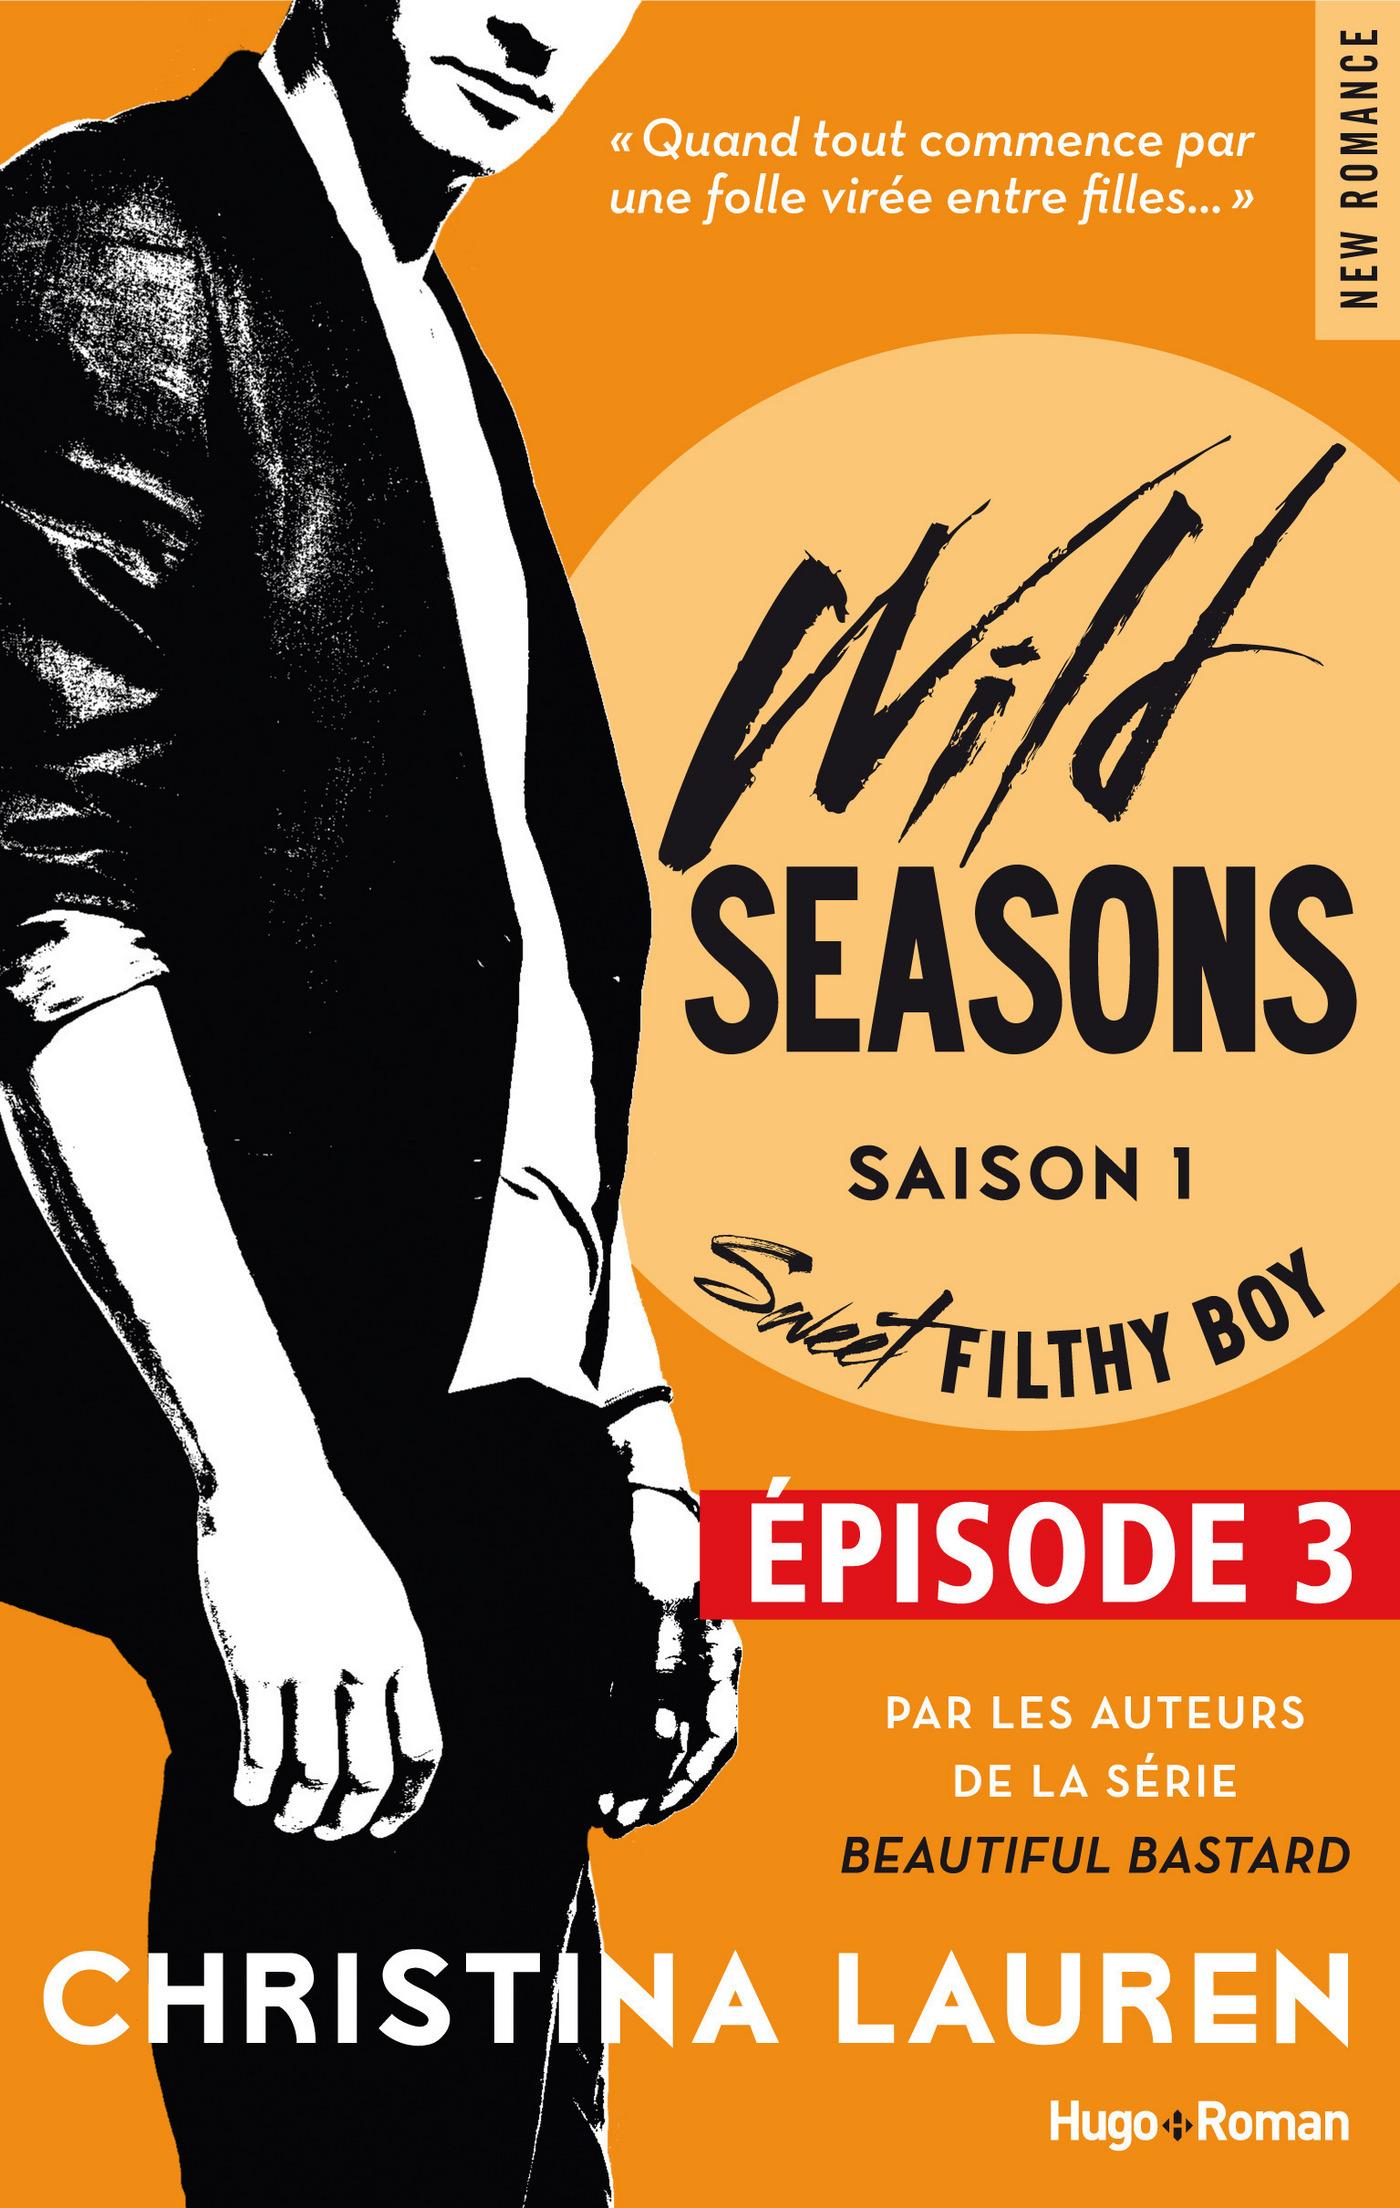 Wild Seasons Saison 1 Sweet filty boy Episode 3